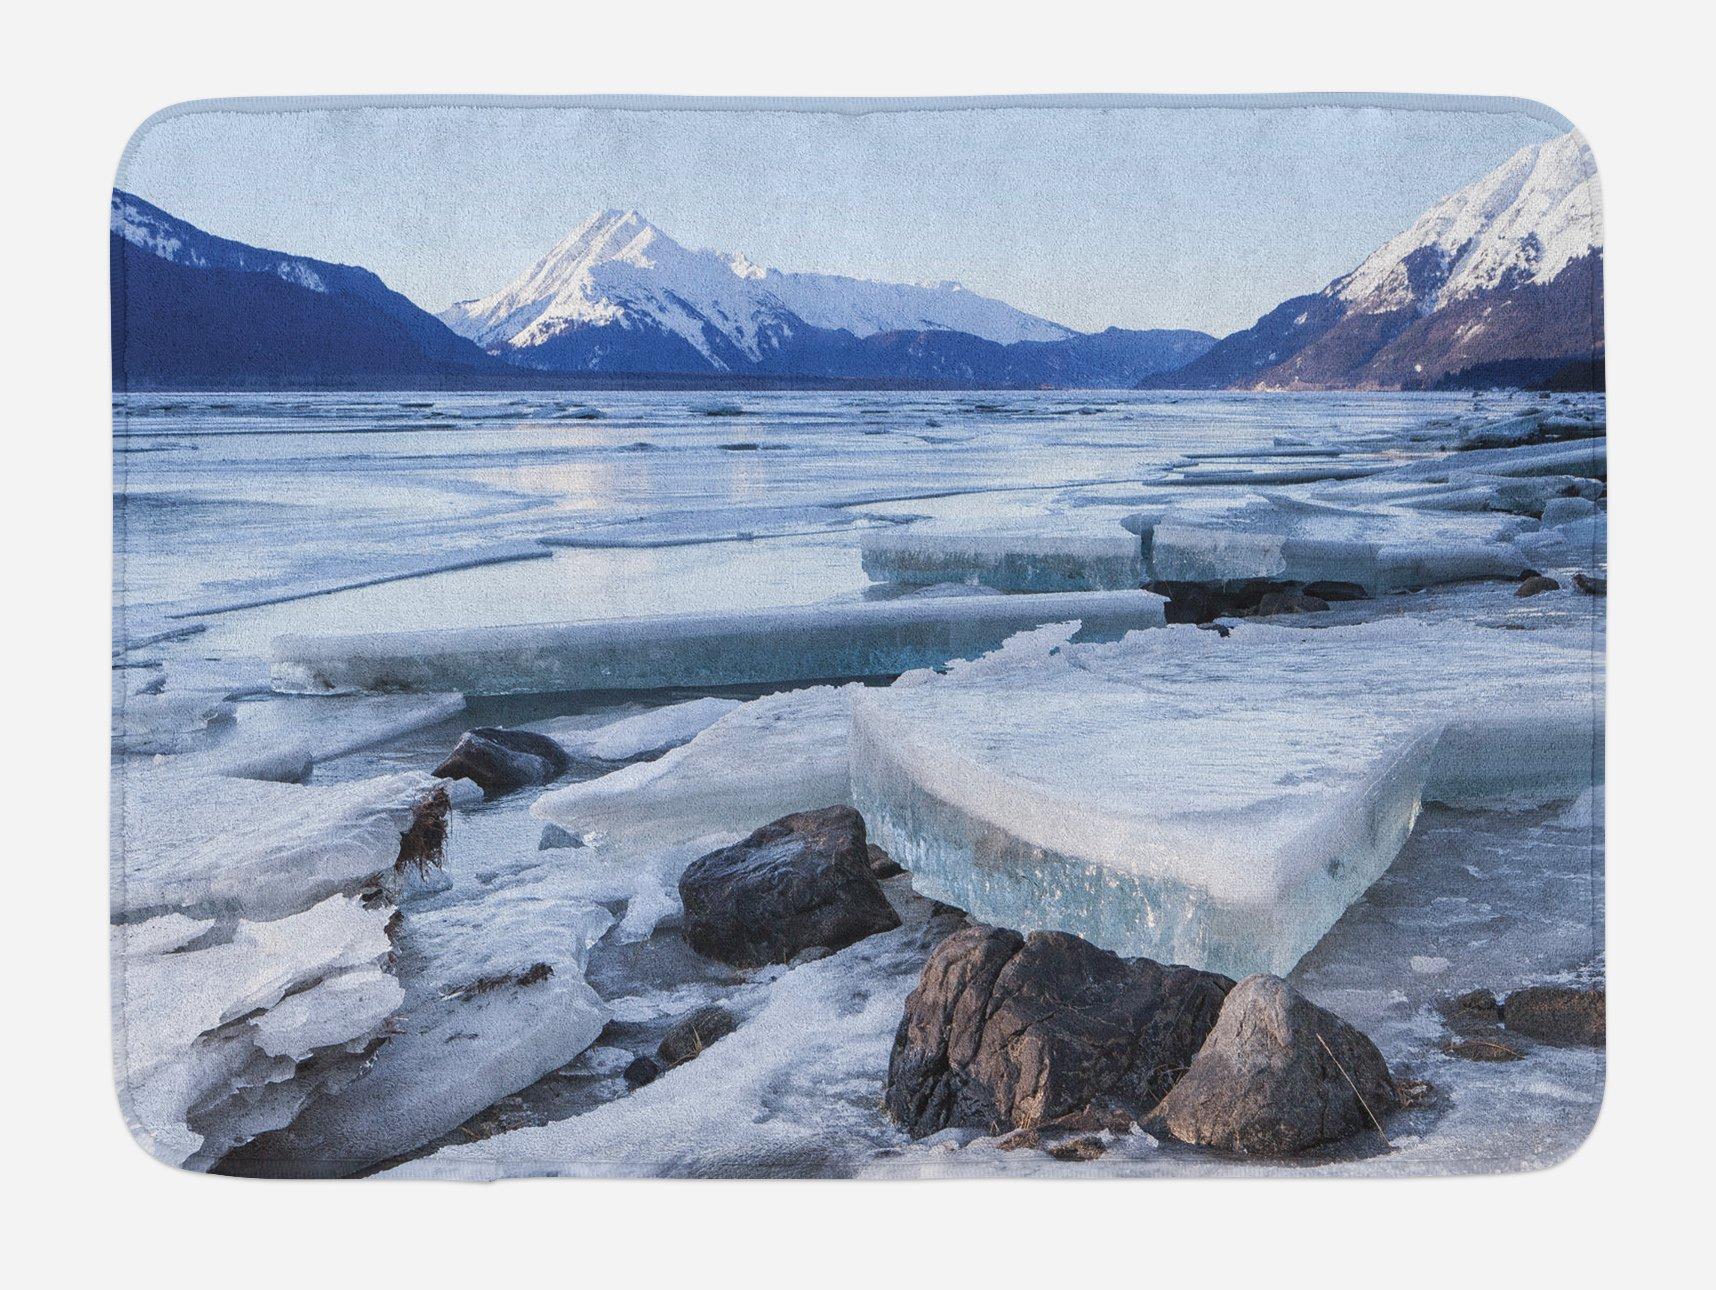 Ambesonne Alaska Bath Mat, Ice Chunks on The Side of Chilkat River in North America Winter Season, Plush Bathroom Decor Mat with Non Slip Backing, 29.5 W X 17.5 W Inches, Seafoam White Sky Blue